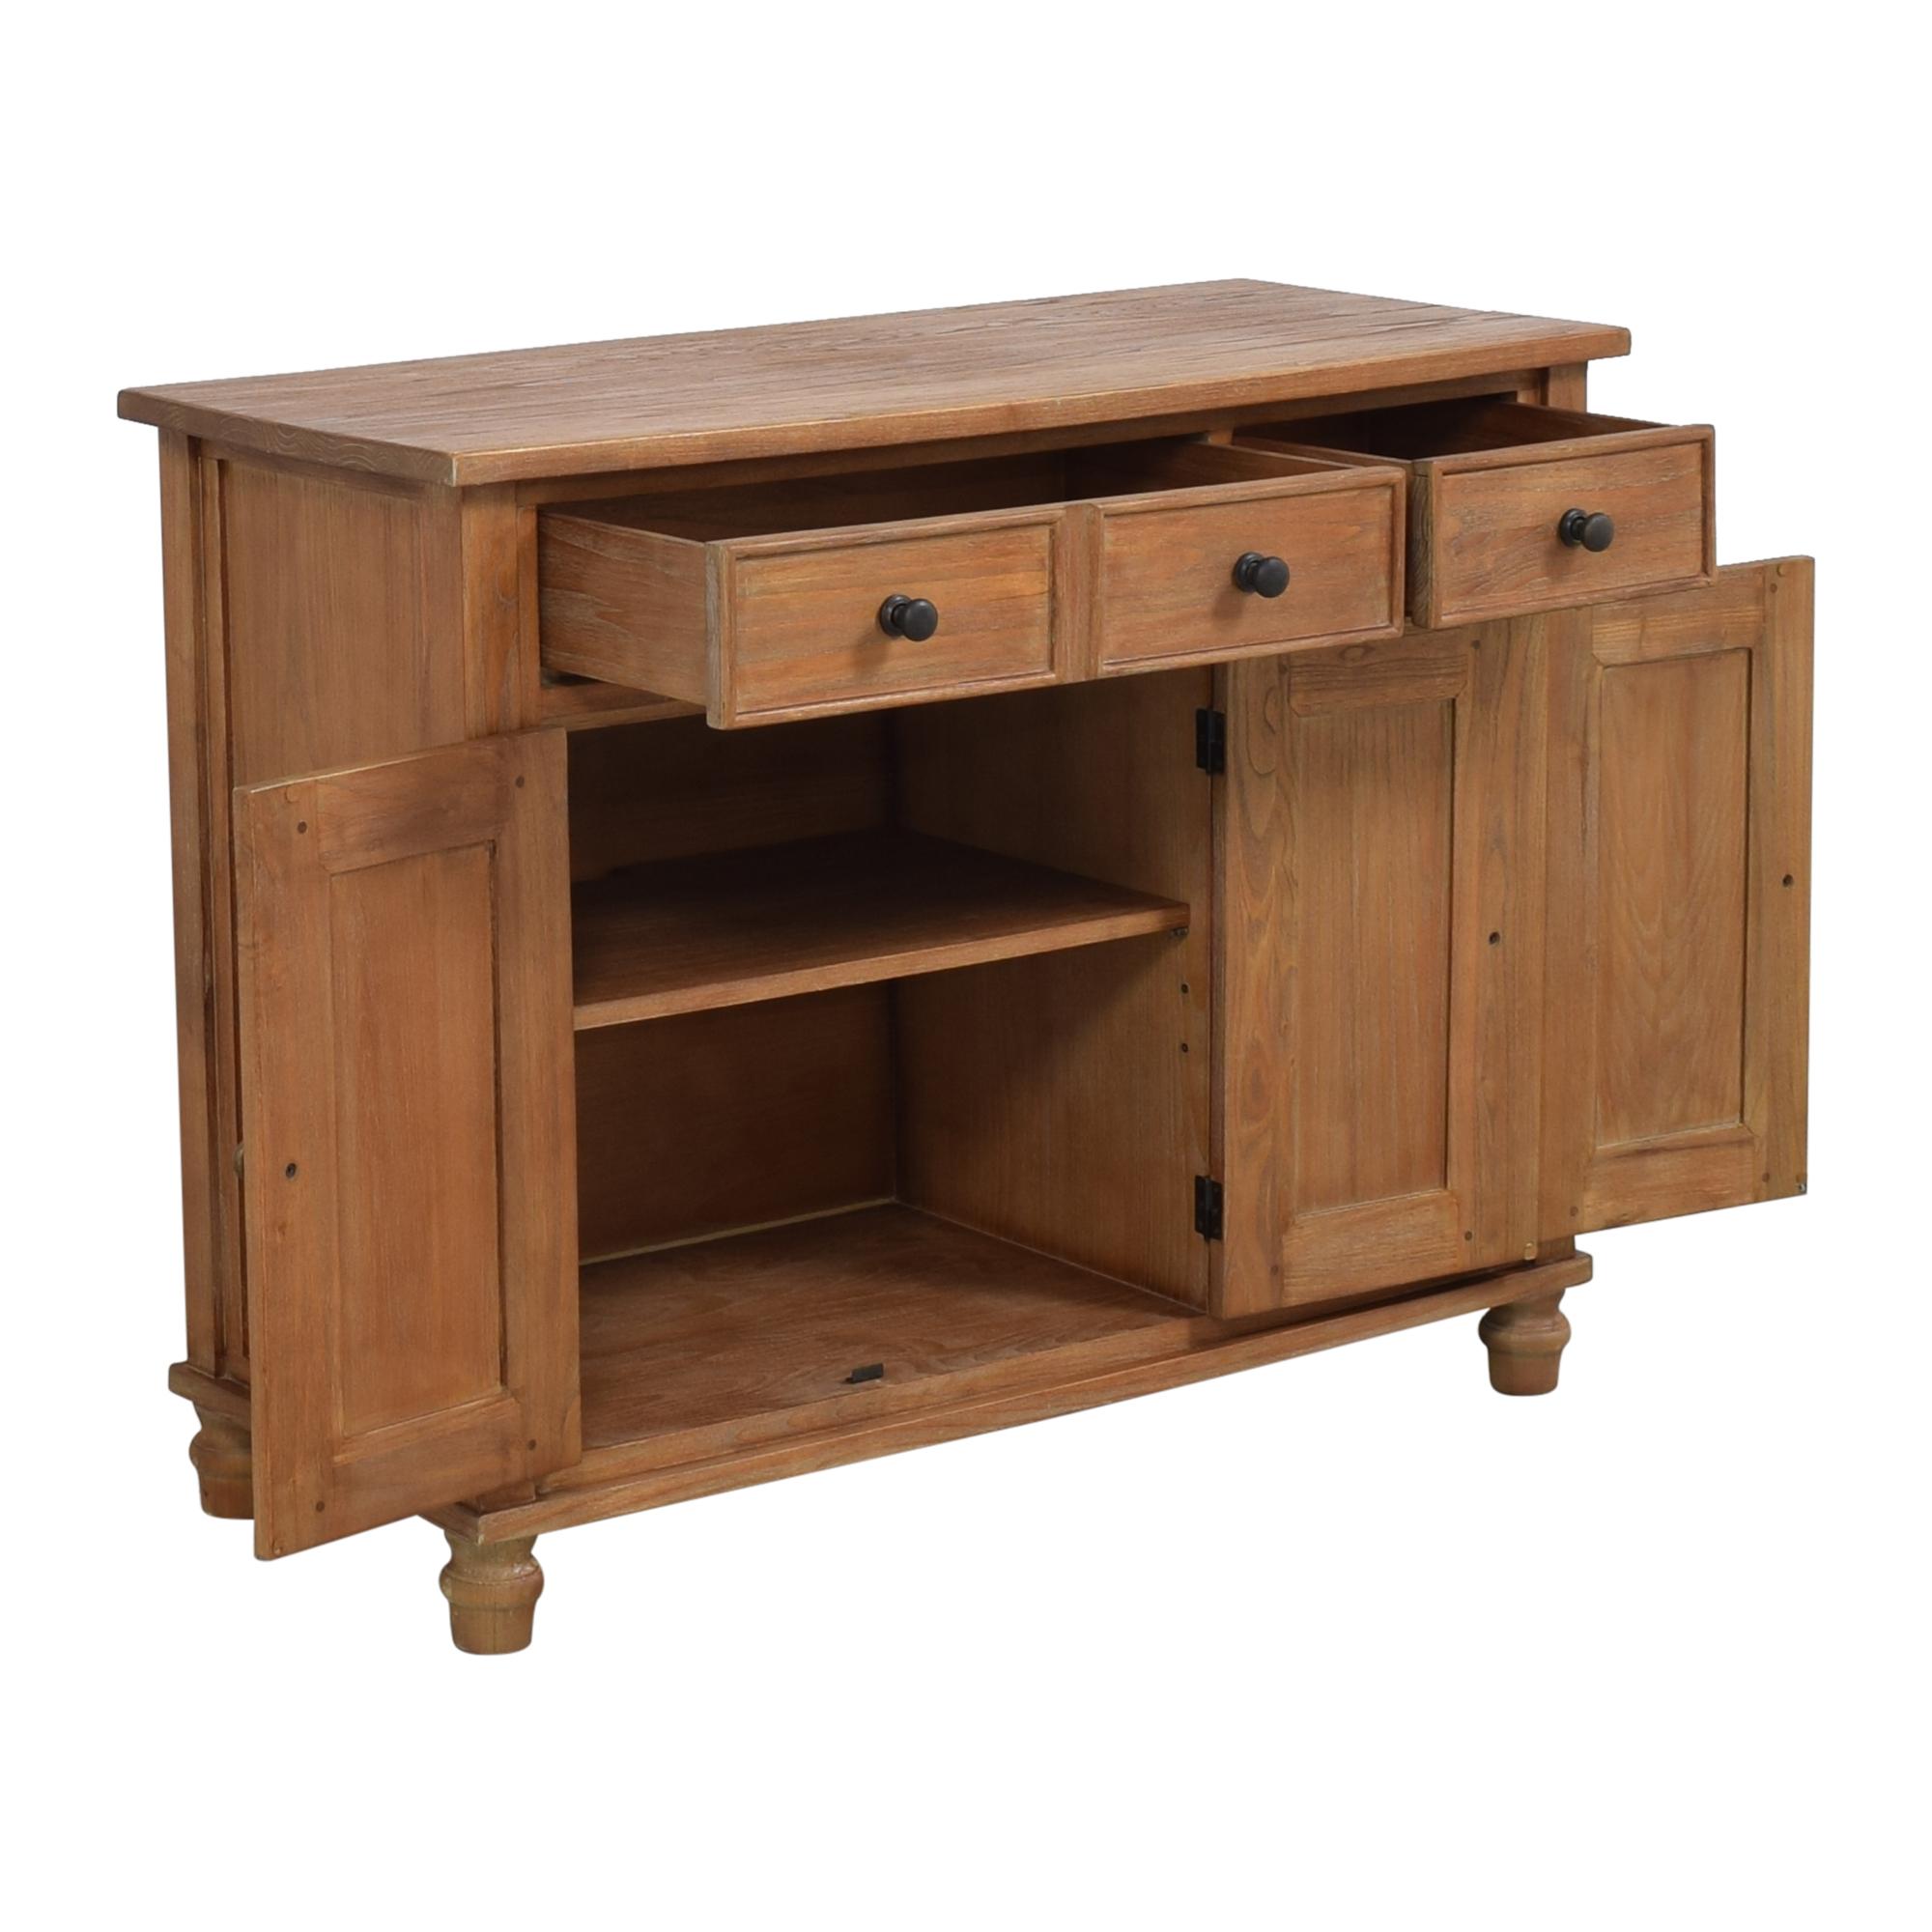 buy Crate & Barrel Kipling Buffet Cabinet Crate & Barrel Cabinets & Sideboards